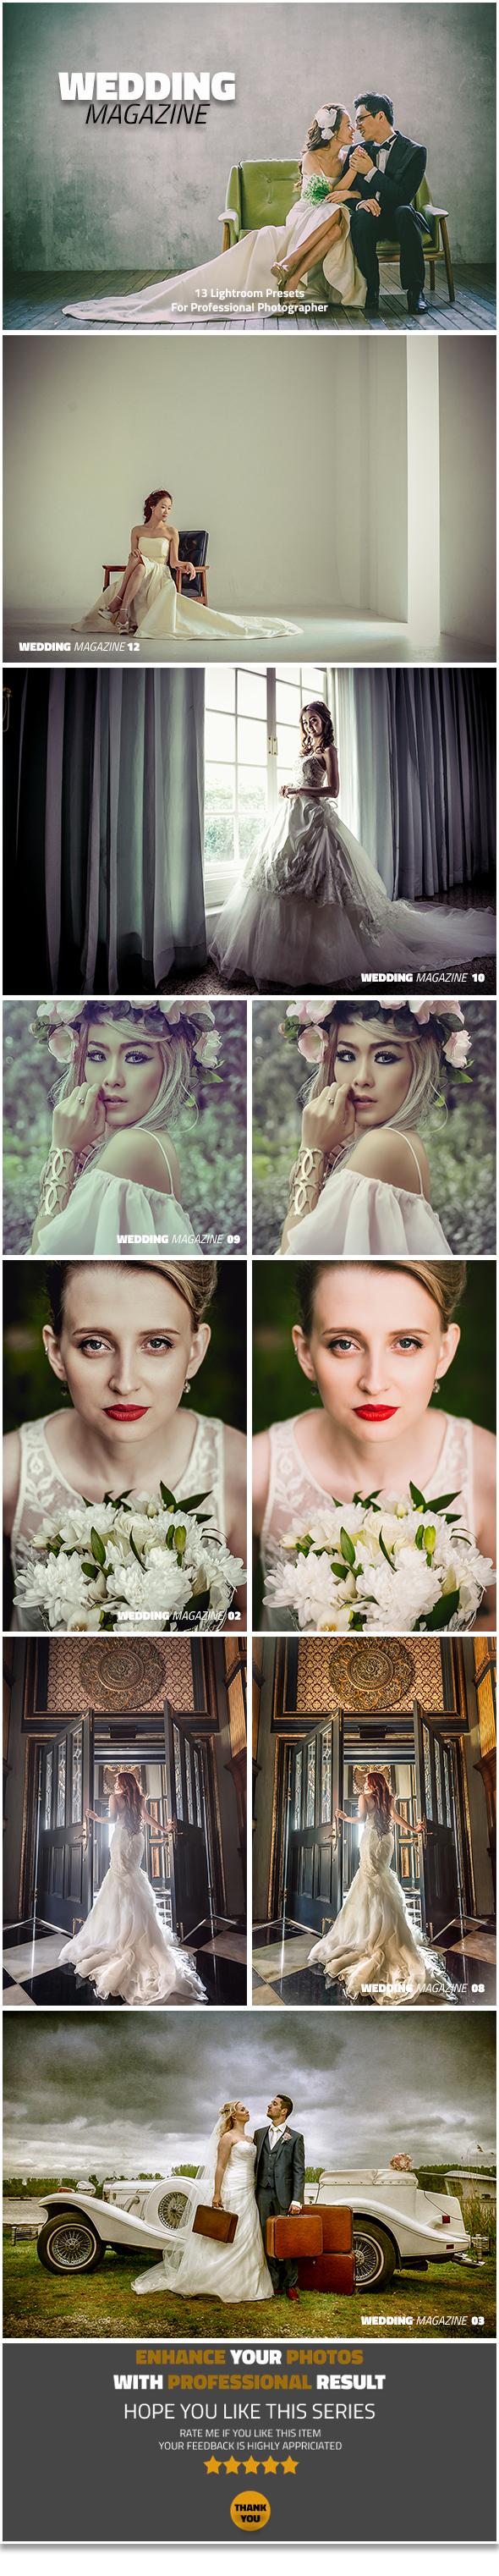 13 Wedding Magazine Lightroom presets - Lightroom Presets Add-ons